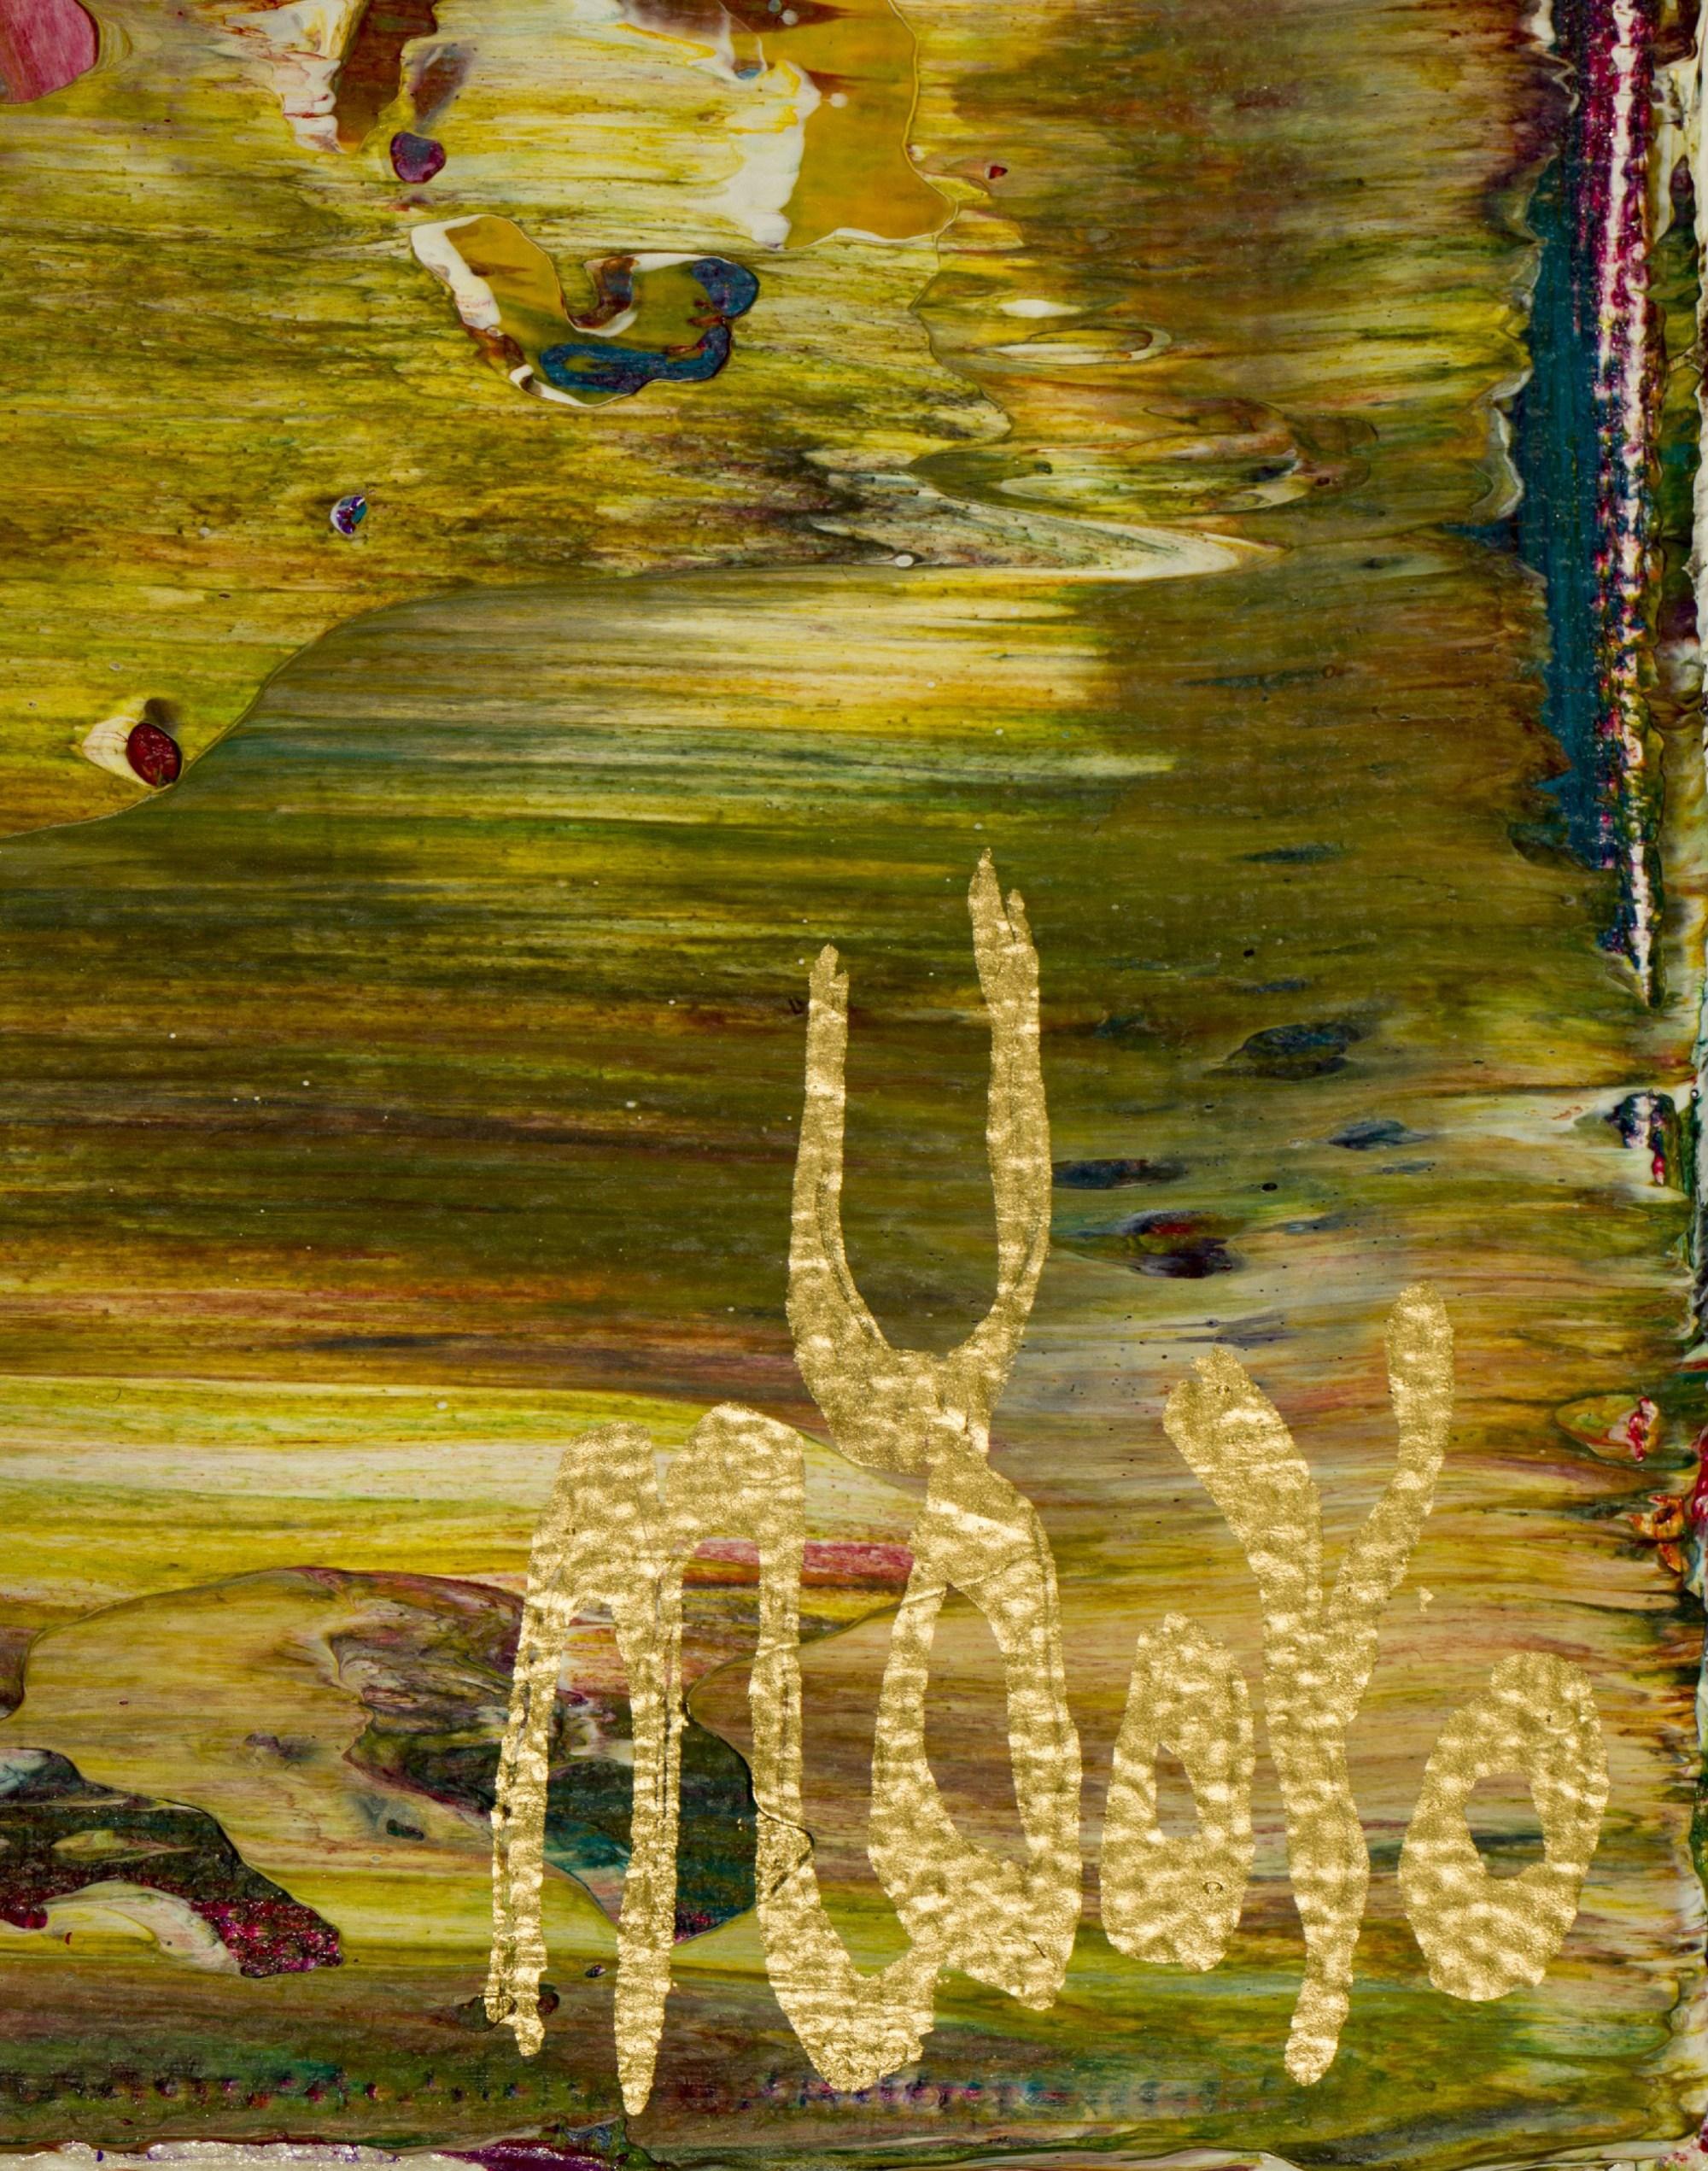 SOLD / Autumn Mirrors (2020) by Nestor Toro